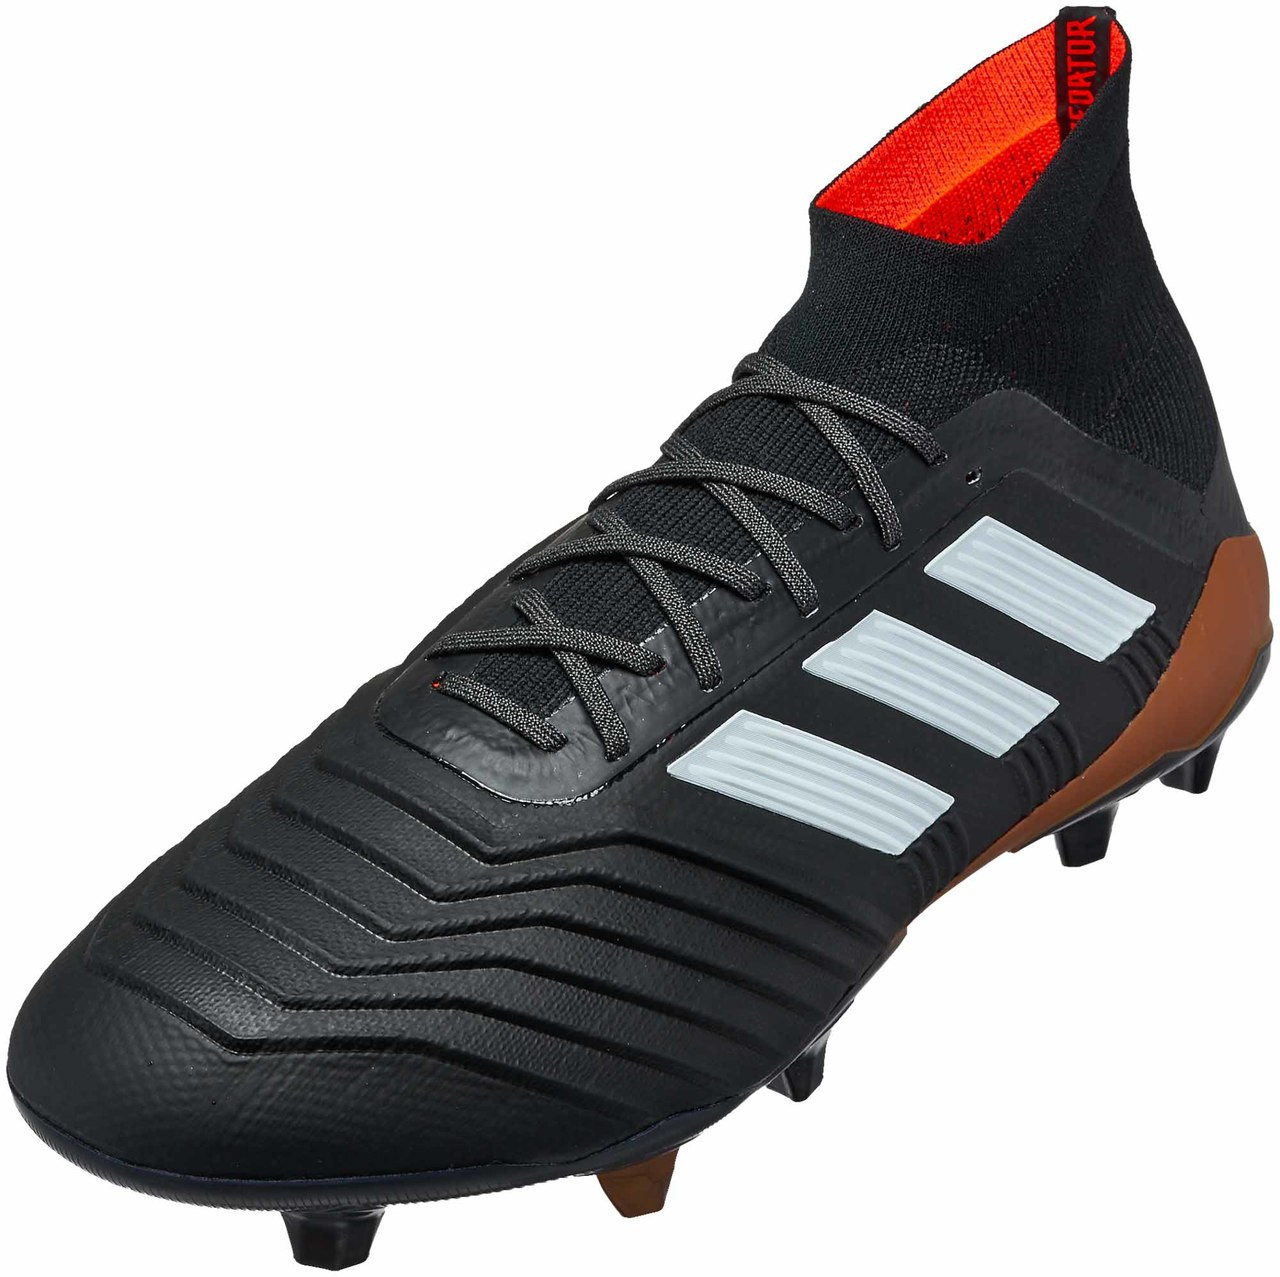 5008493f0025 Adidas Predator 18.1 FG - Black White Solar Red (111617) - ohp soccer